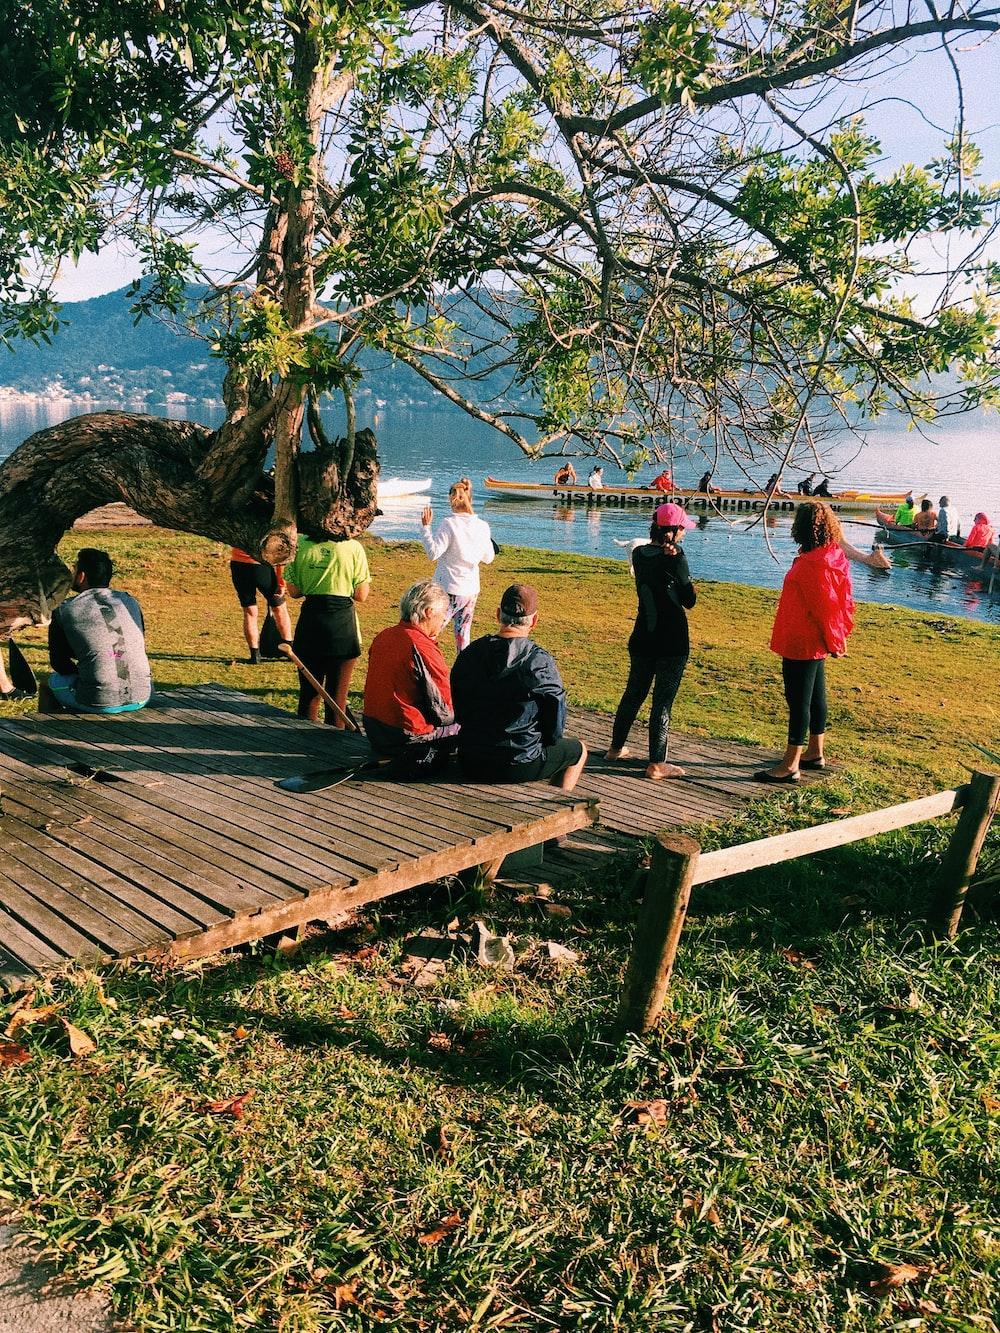 people near lake